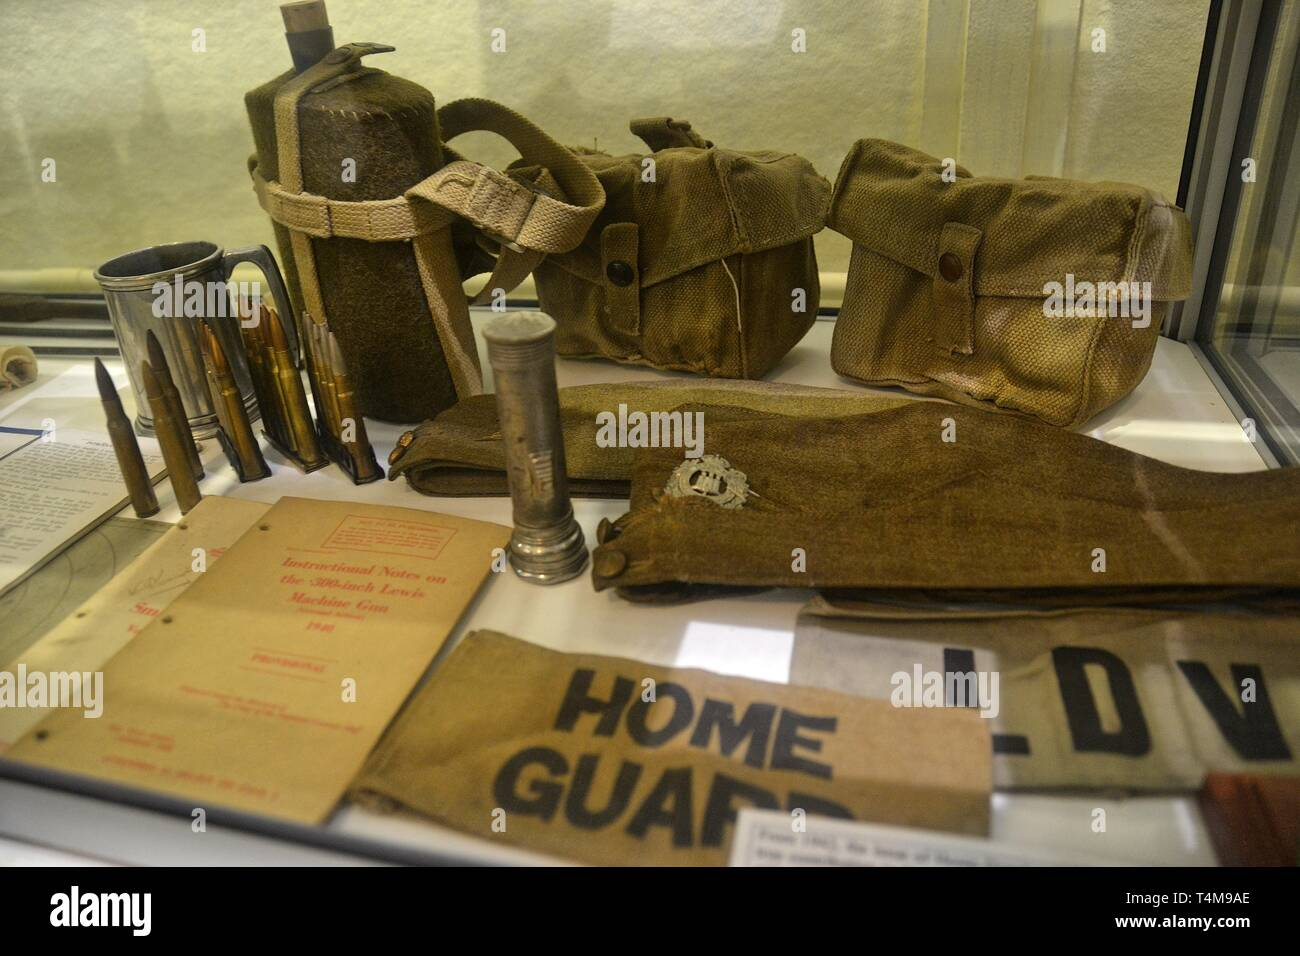 Home Guard voci sul display a Parham Airfield Museum, Framlingham, Suffolk, Inghilterra, Regno Unito Immagini Stock